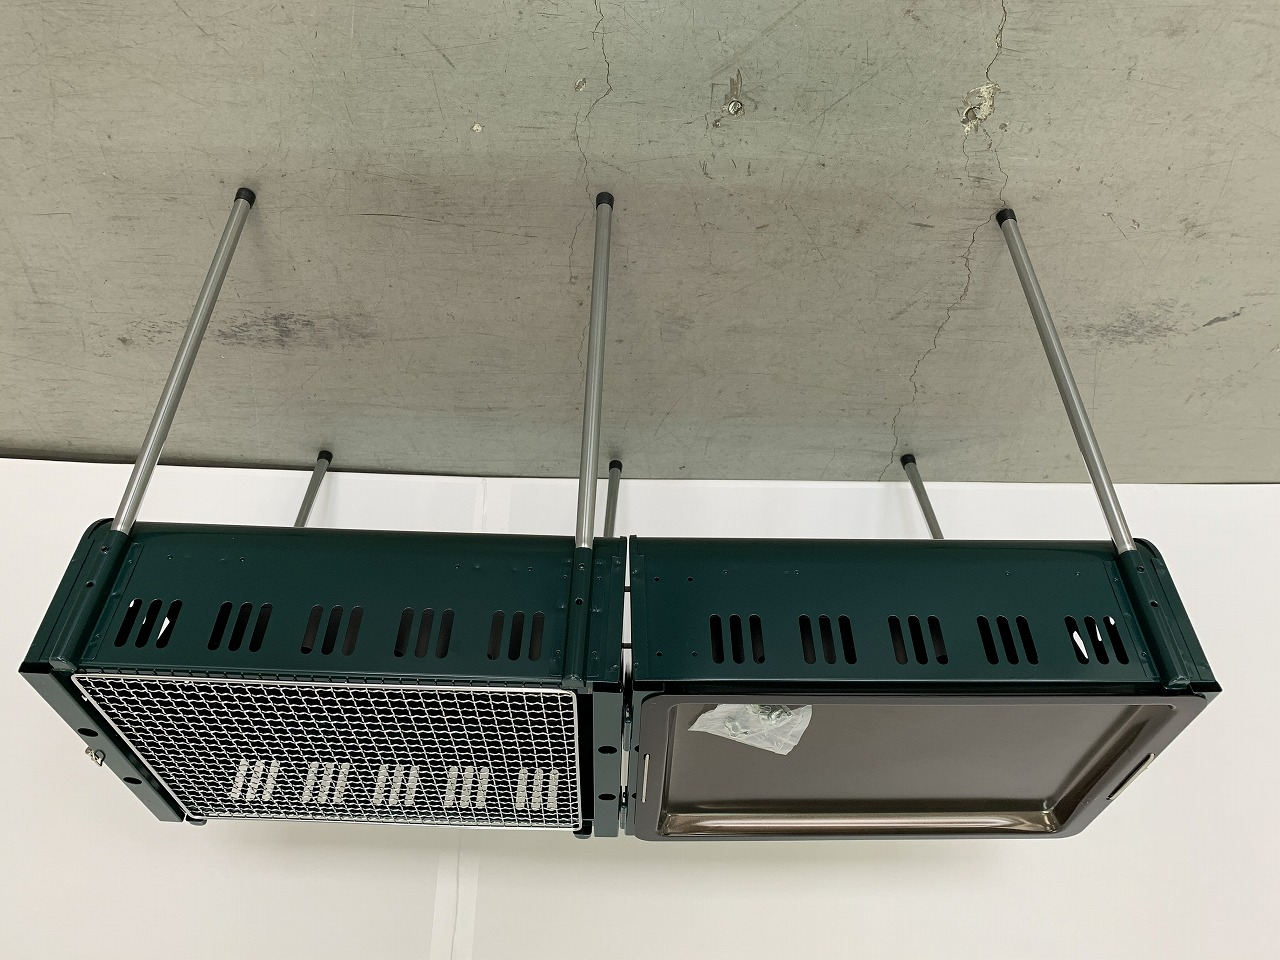 CAPTAIN STAG(キャプテンスタッグ) カリブー ダブルバーベキューコンロ M-8985